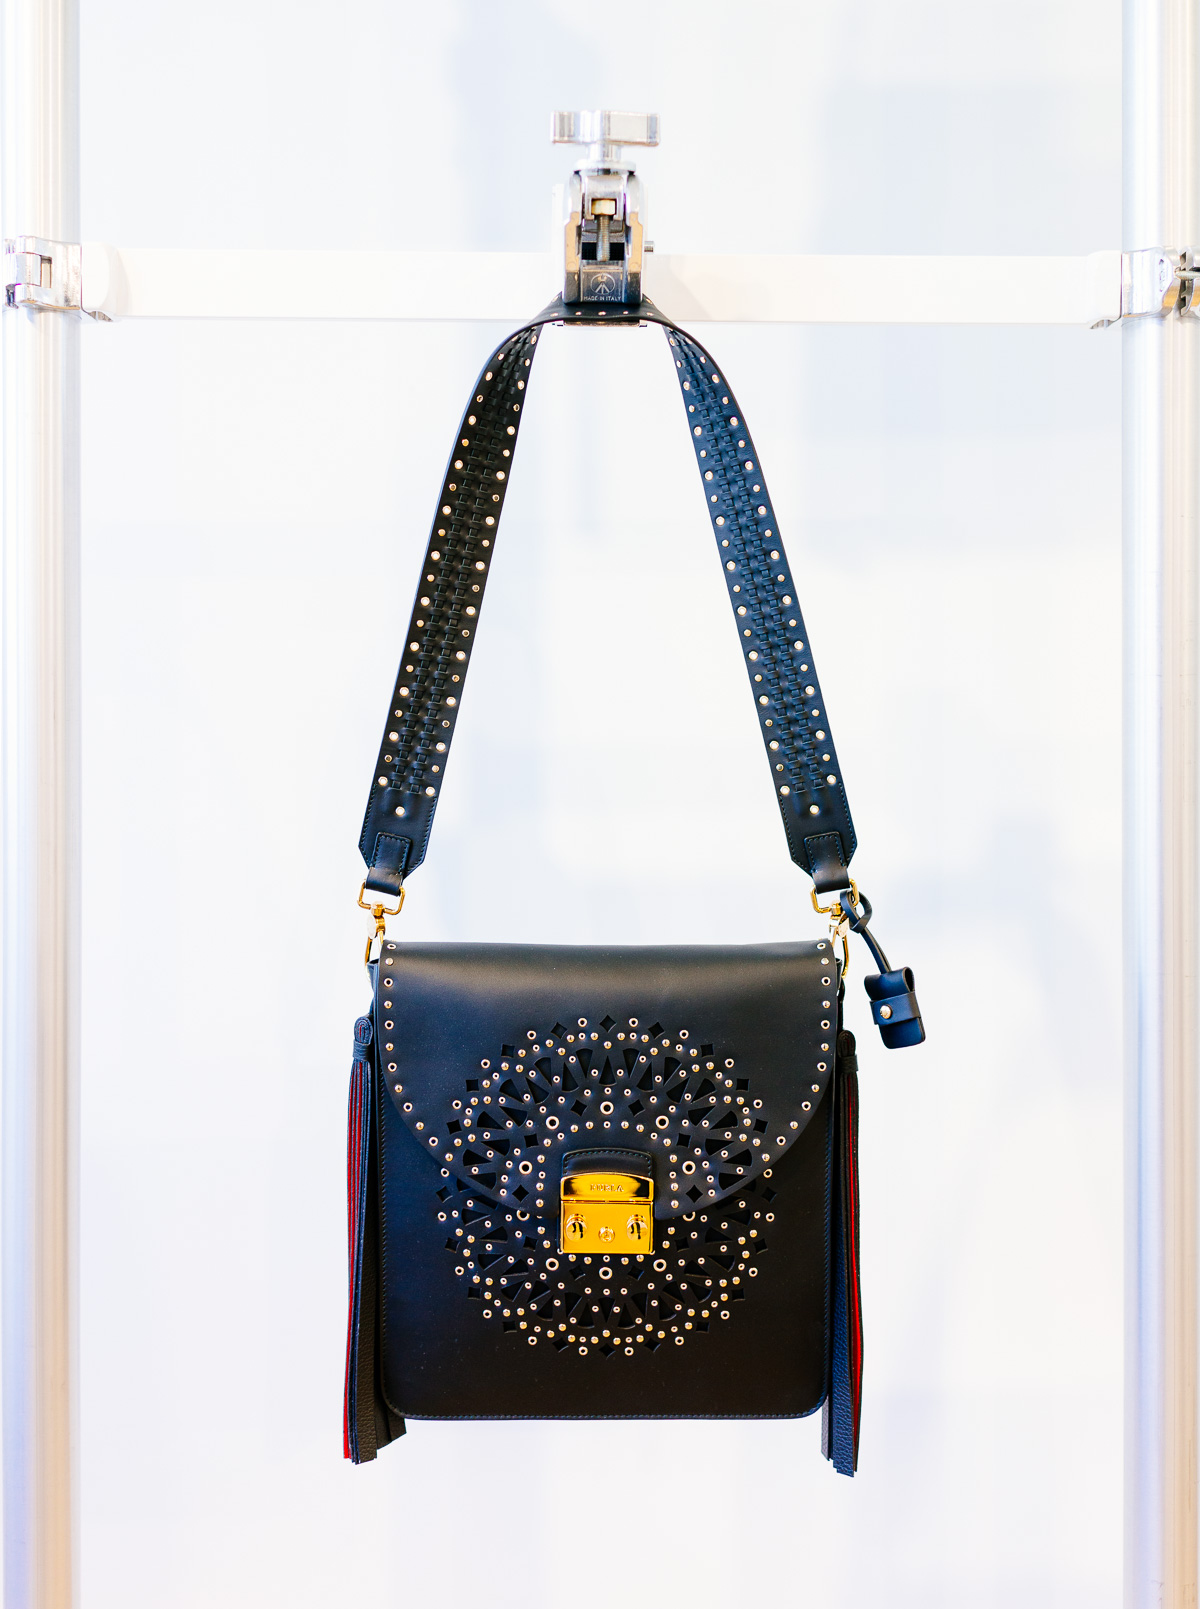 Furla Fall 2016 Bags (15)